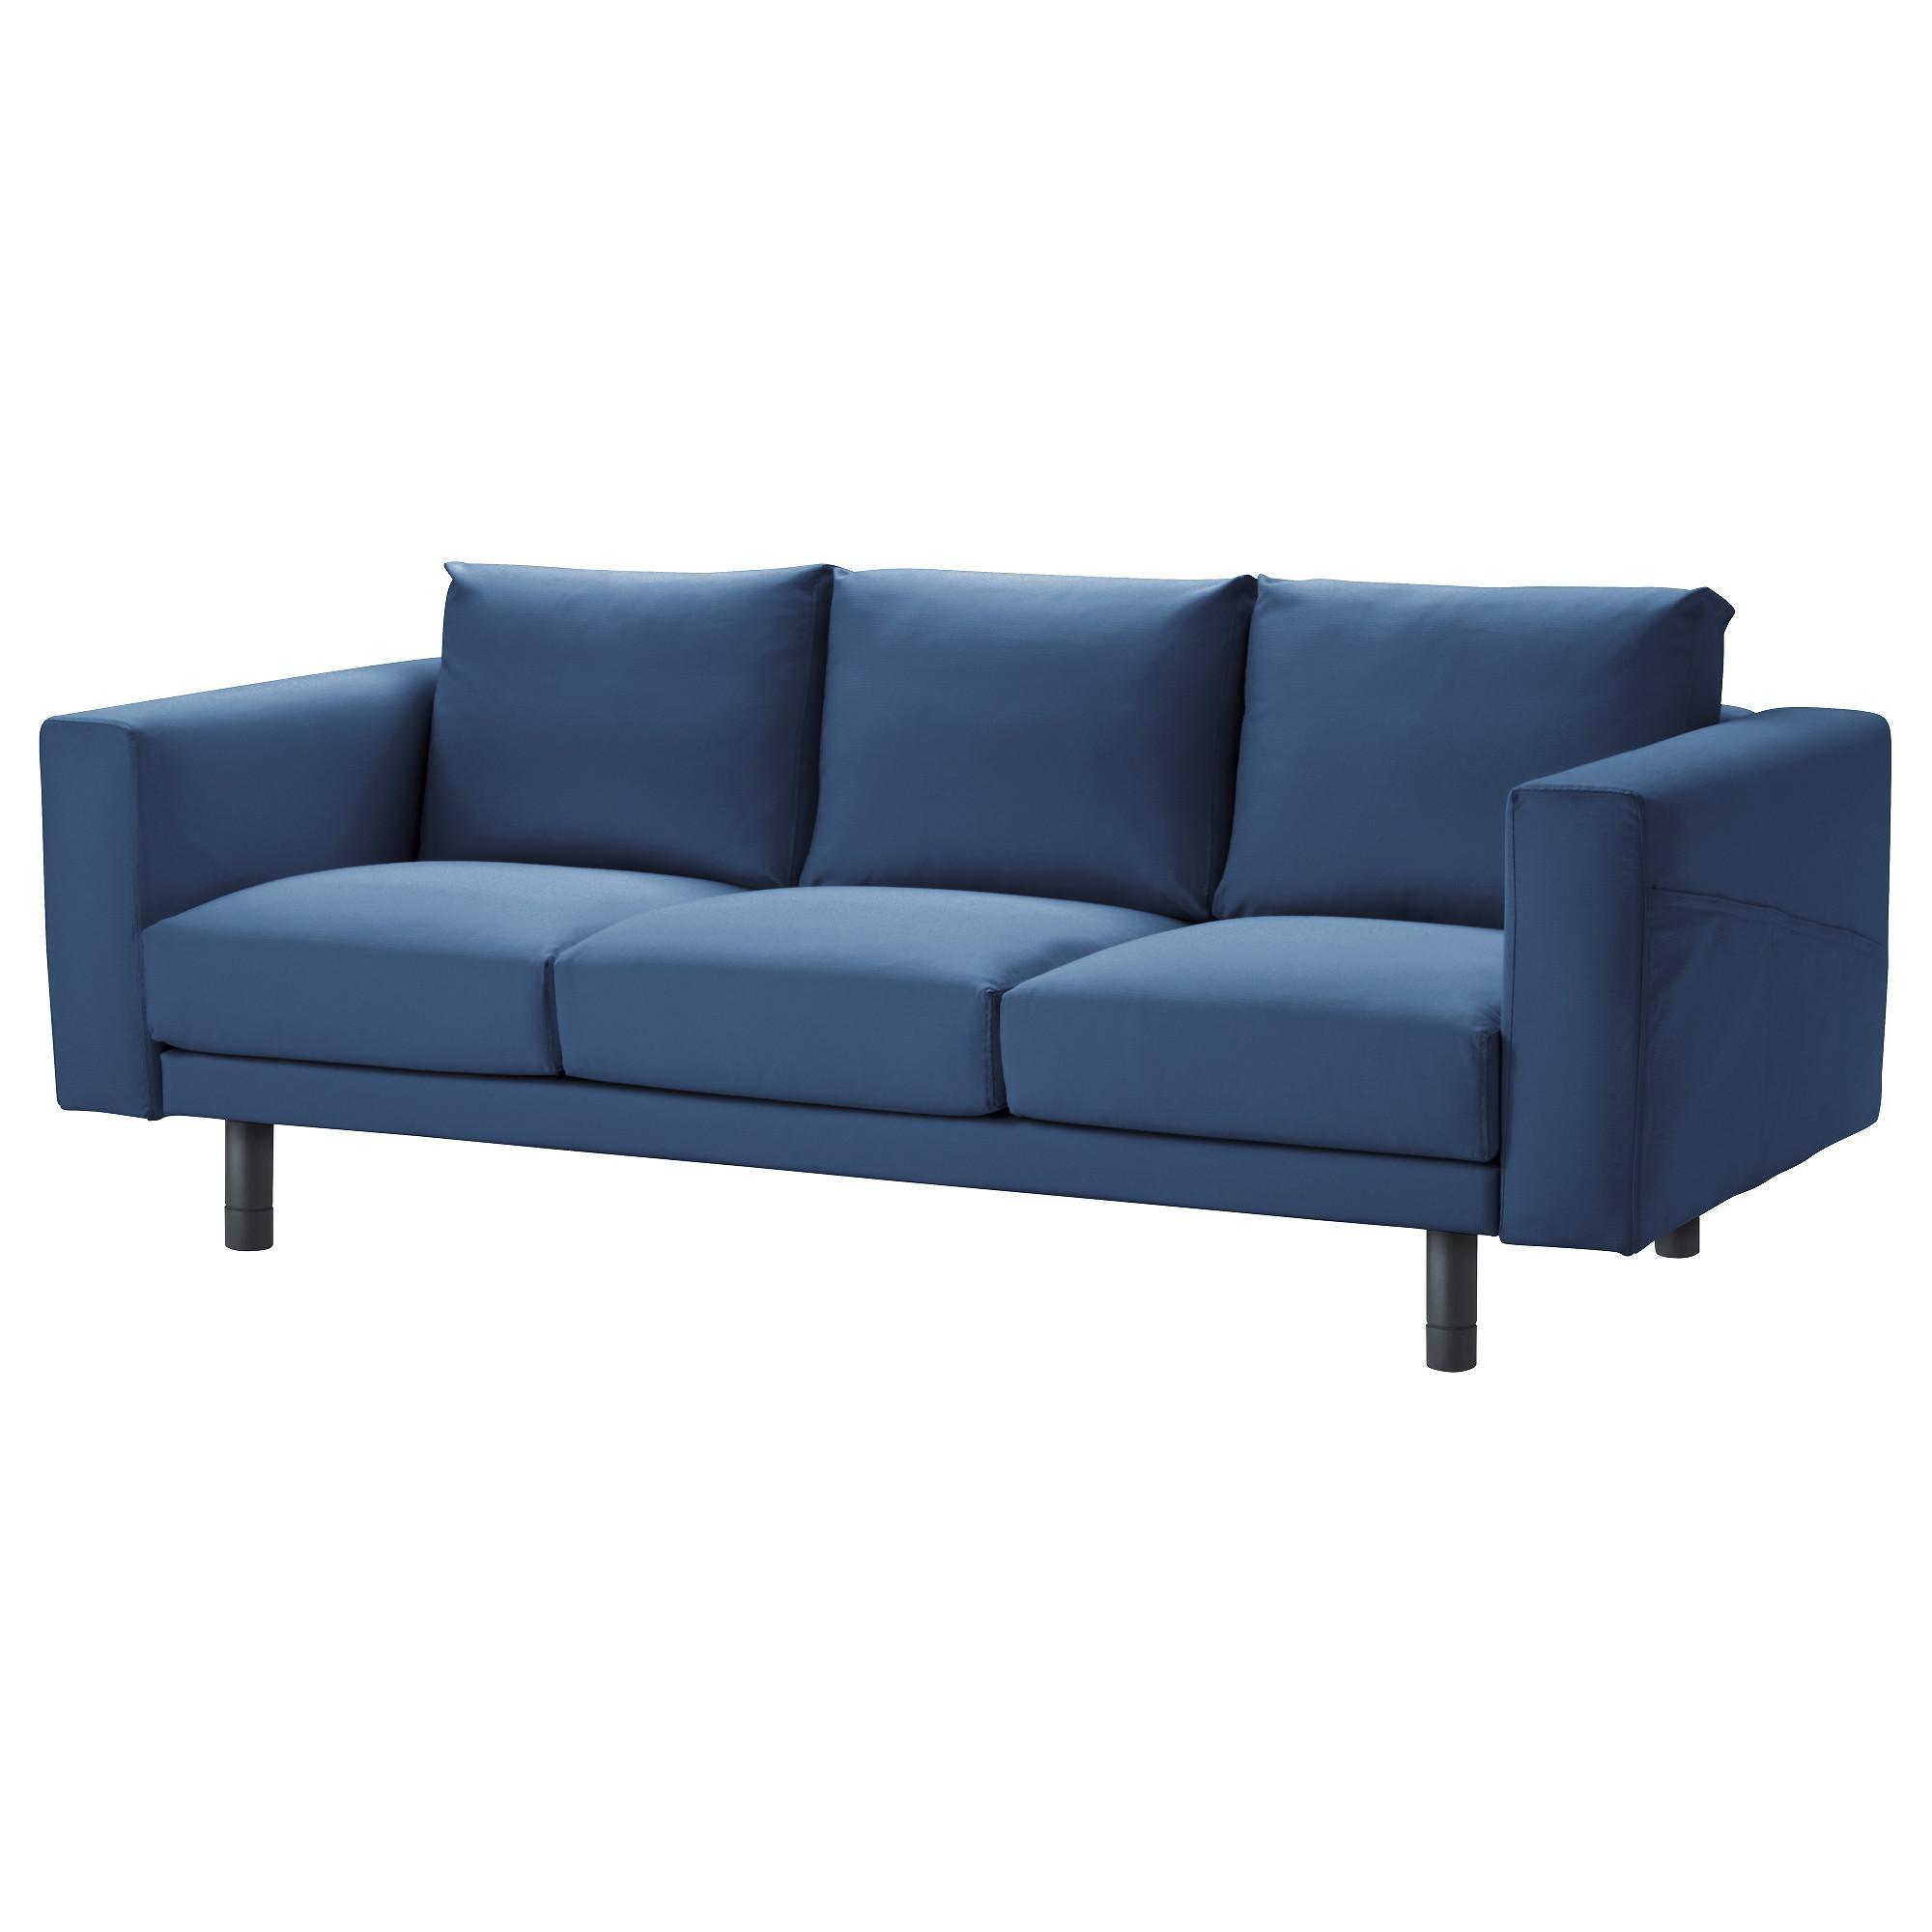 Fabric Sofas – Ikea Inside Blue And White Striped Sofas (Image 13 of 20)